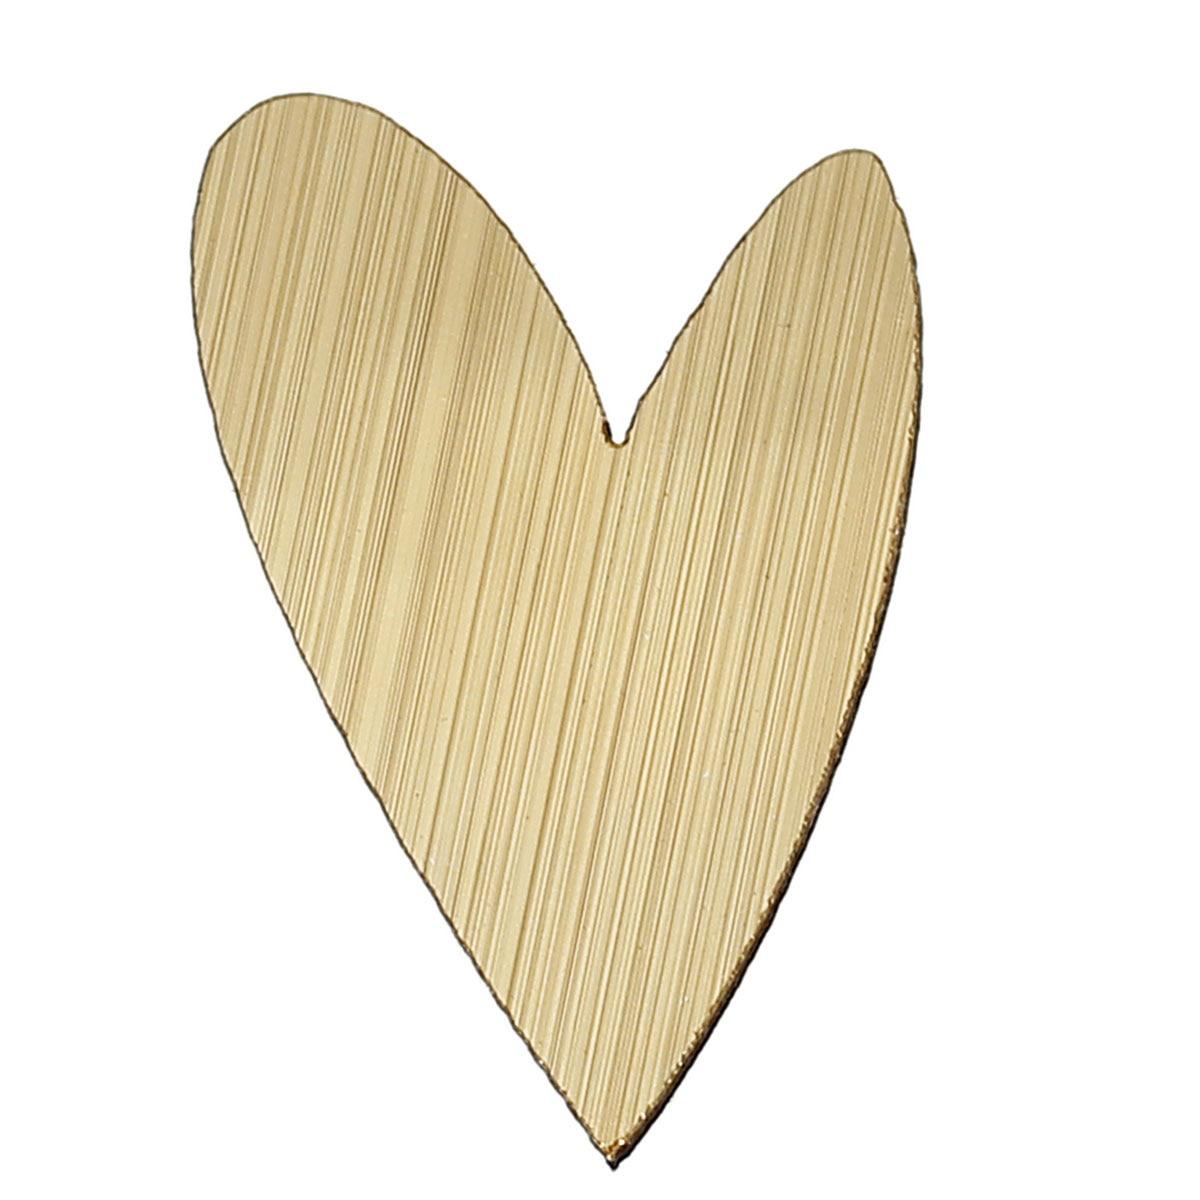 Wood Cabochons Scrapbooking Embellishments Findings Heart Golden 30mm(1 1/8)x 20mm(6/8),50 PCs 2015 new